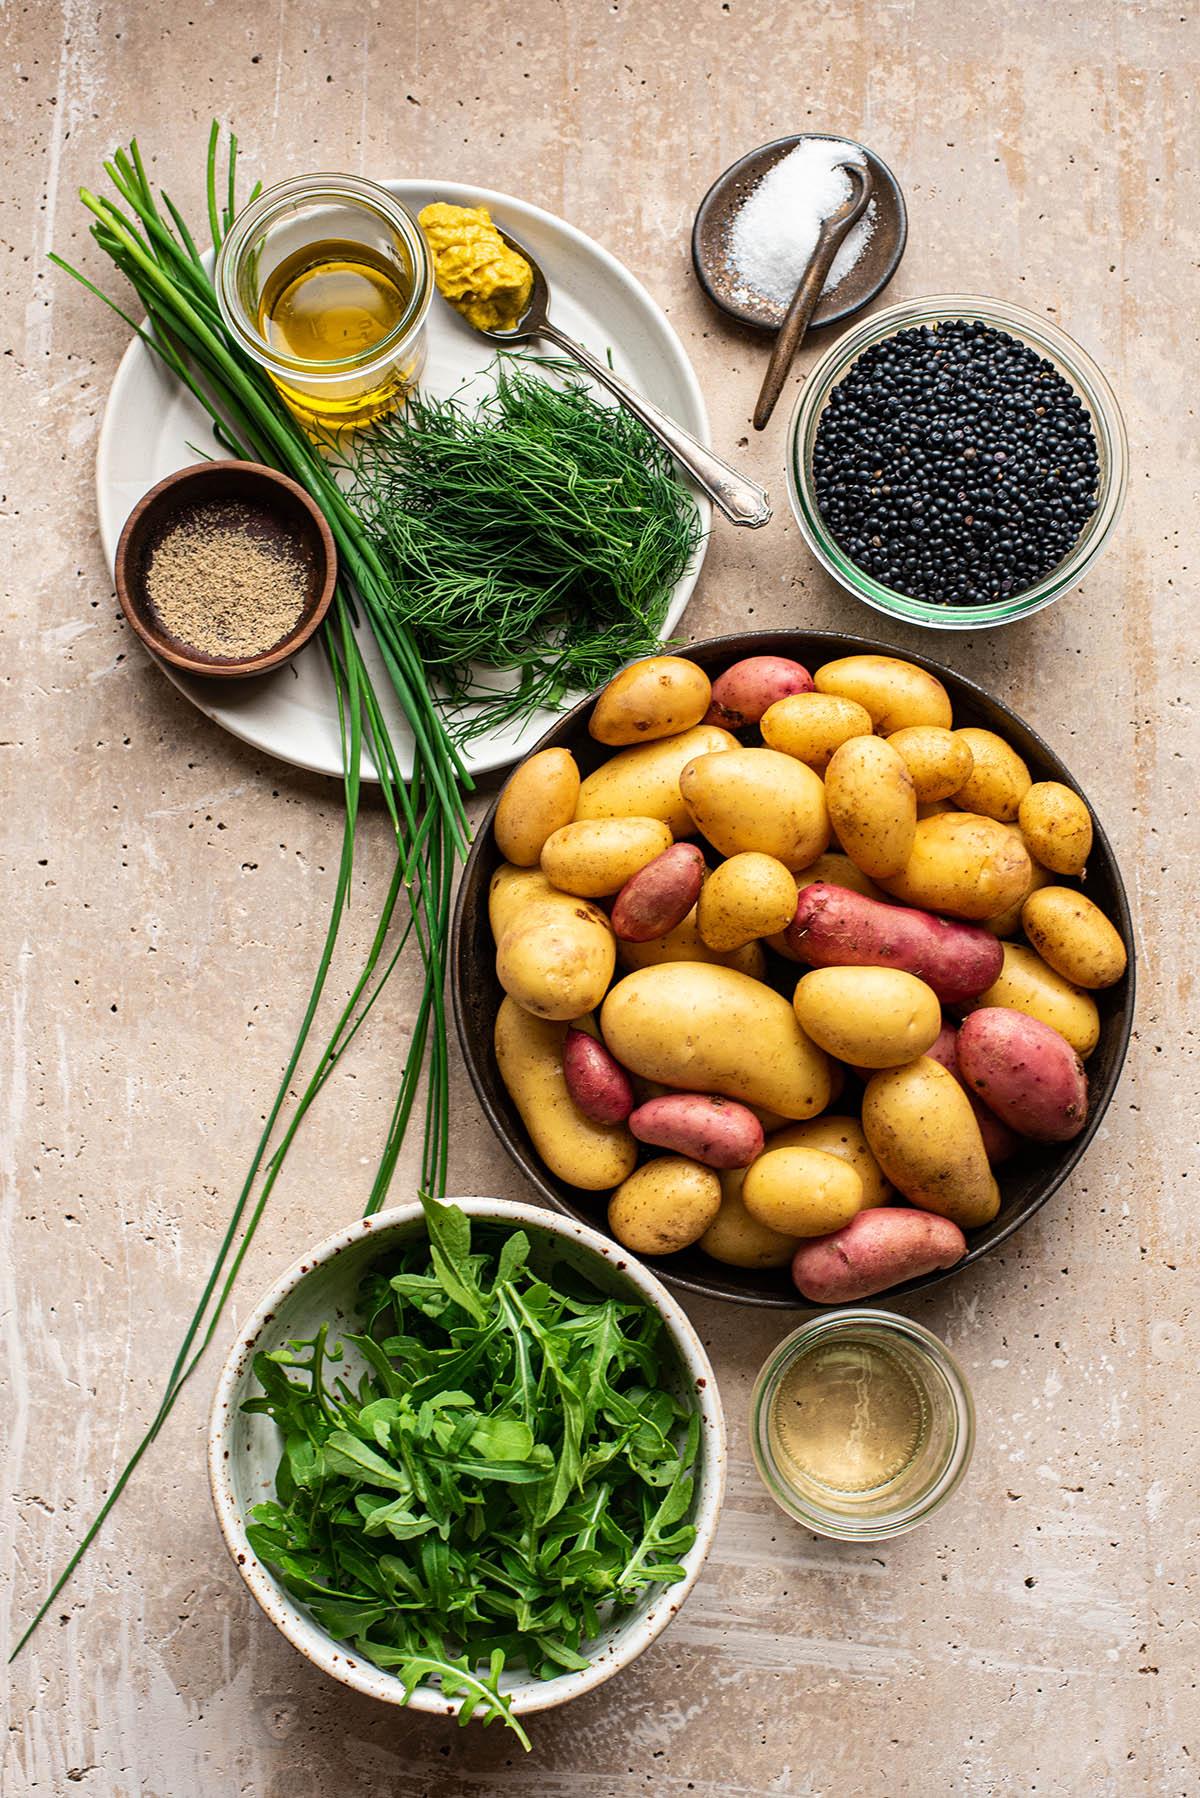 Potato salad ingredients as a flat lay.